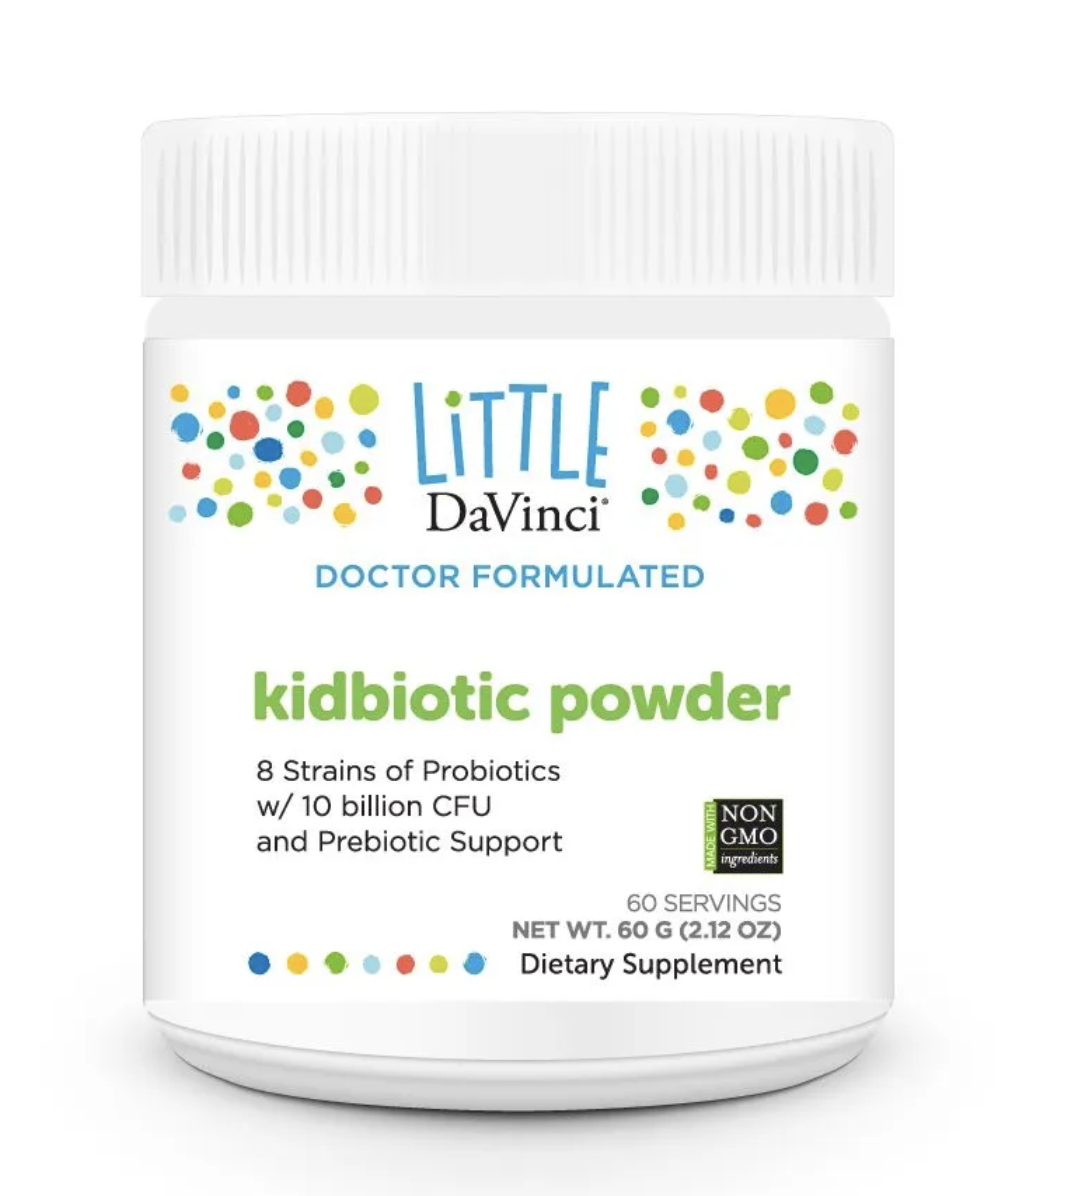 KIDBIOTIC POWDER 60 g DaVinci Laboratories